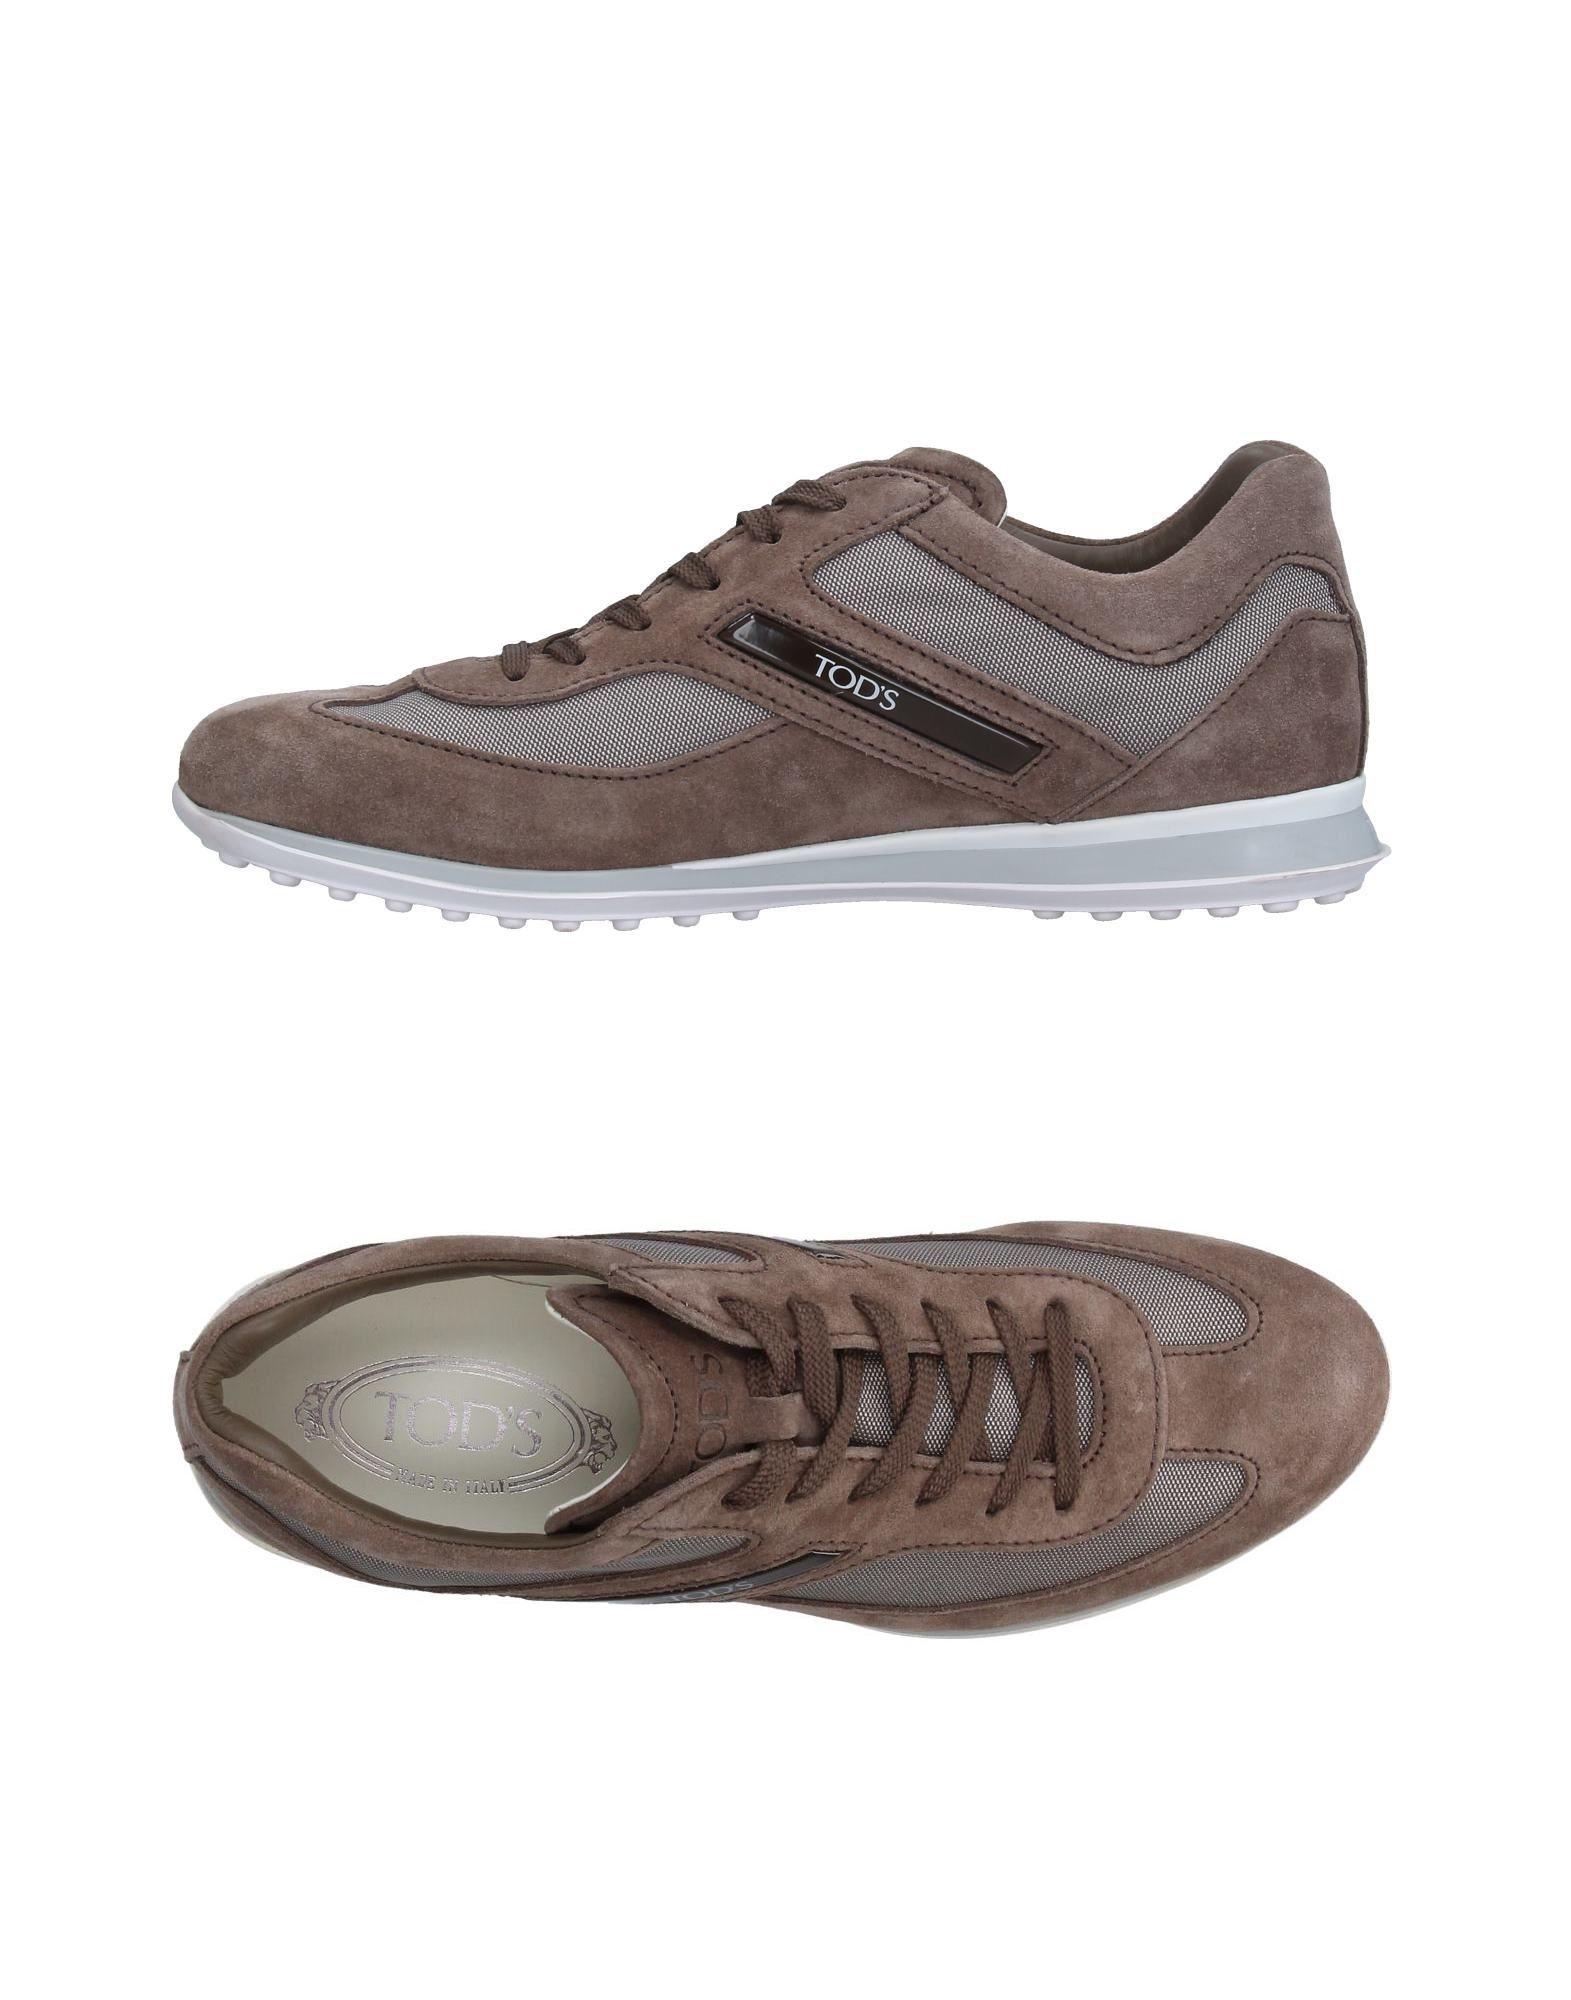 Moda Sneakers Sneakers Moda Tod's Uomo - 11251620VG 34152c